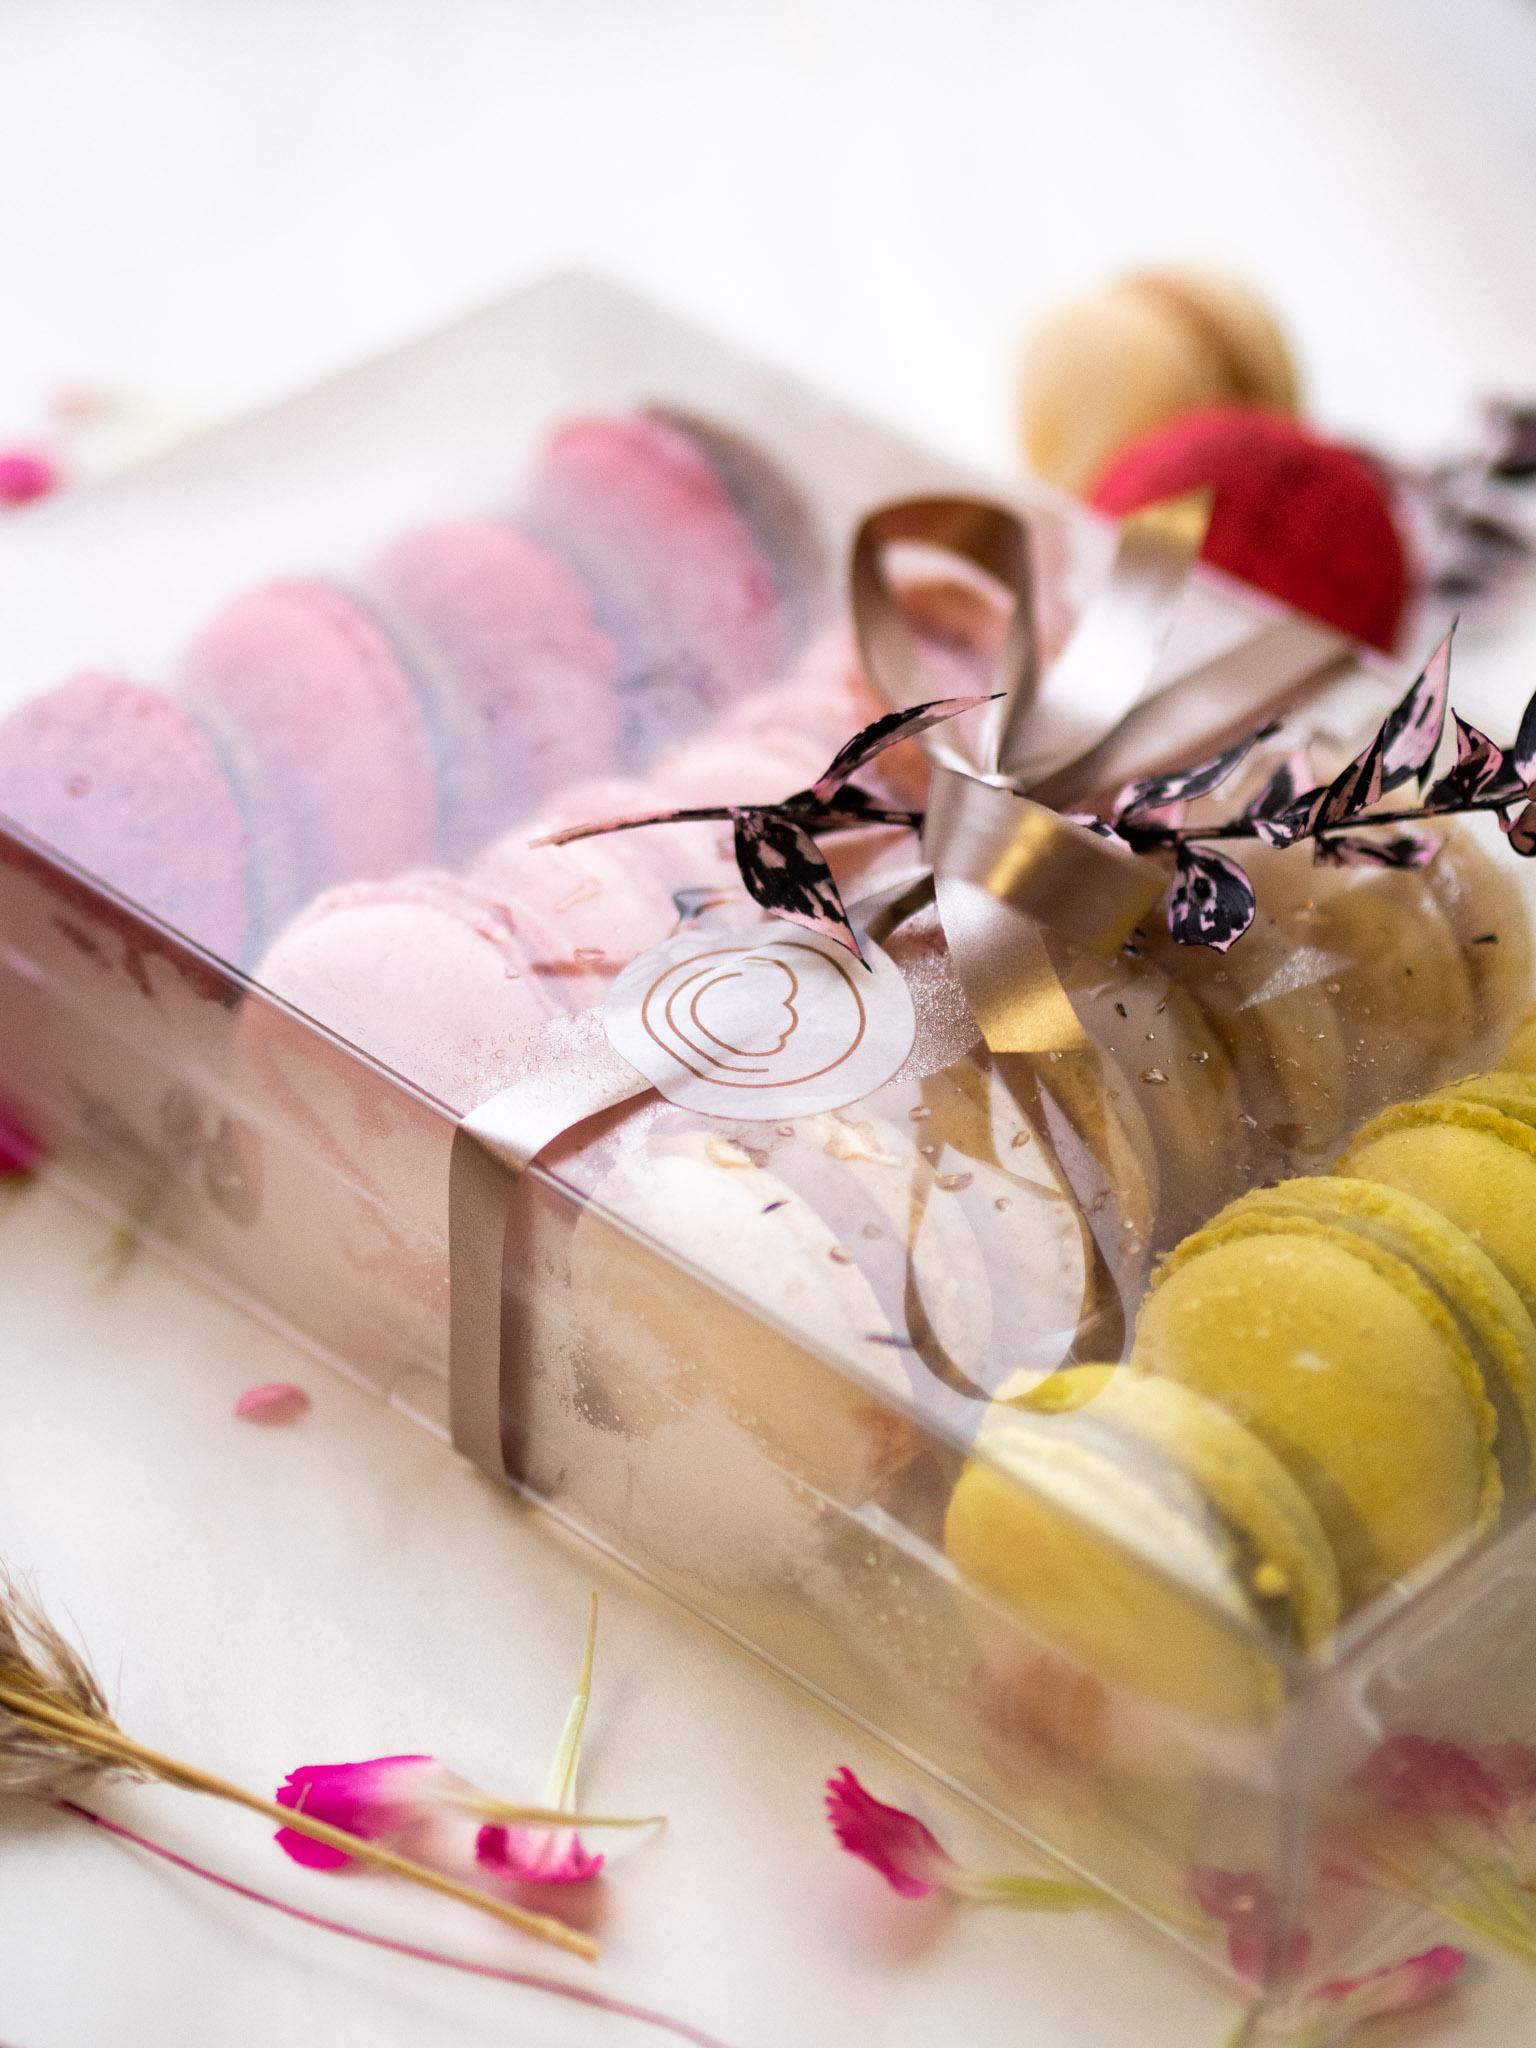 Macarons 16 er Box, 4 verschiedene Sorten Mai 2021